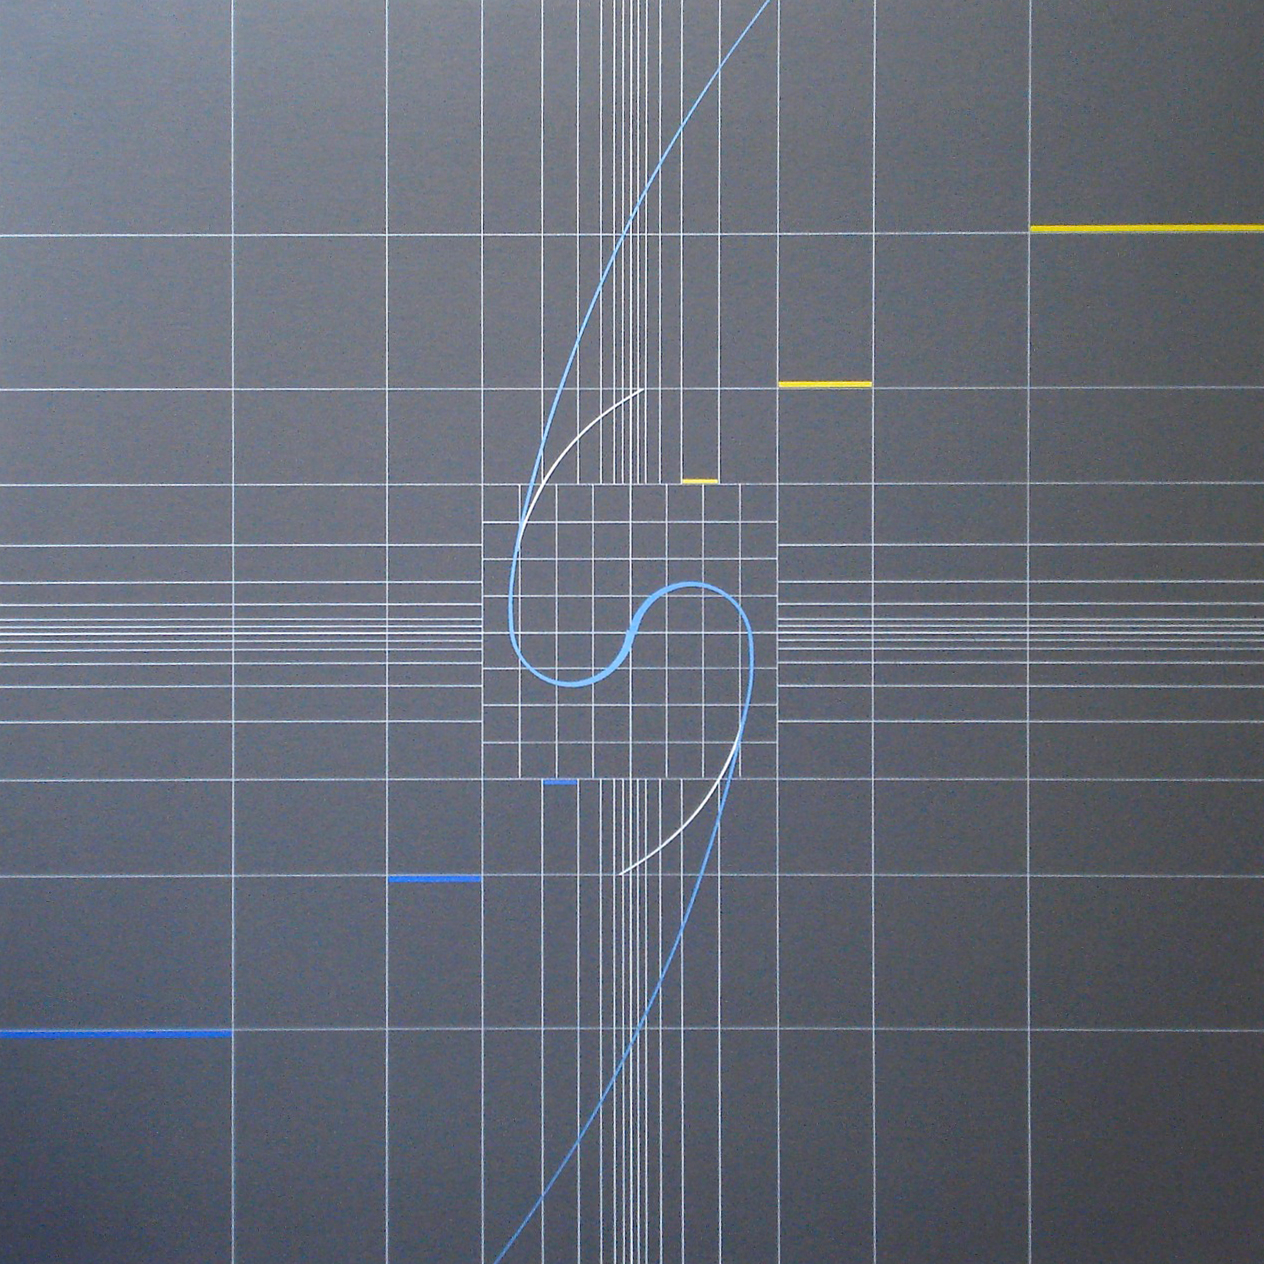 Yantra-ipsum-samsara(3)2011.Sep acrylic on canvas, wood, 23 5/8 x 23 5/8 in. [60x60cm]